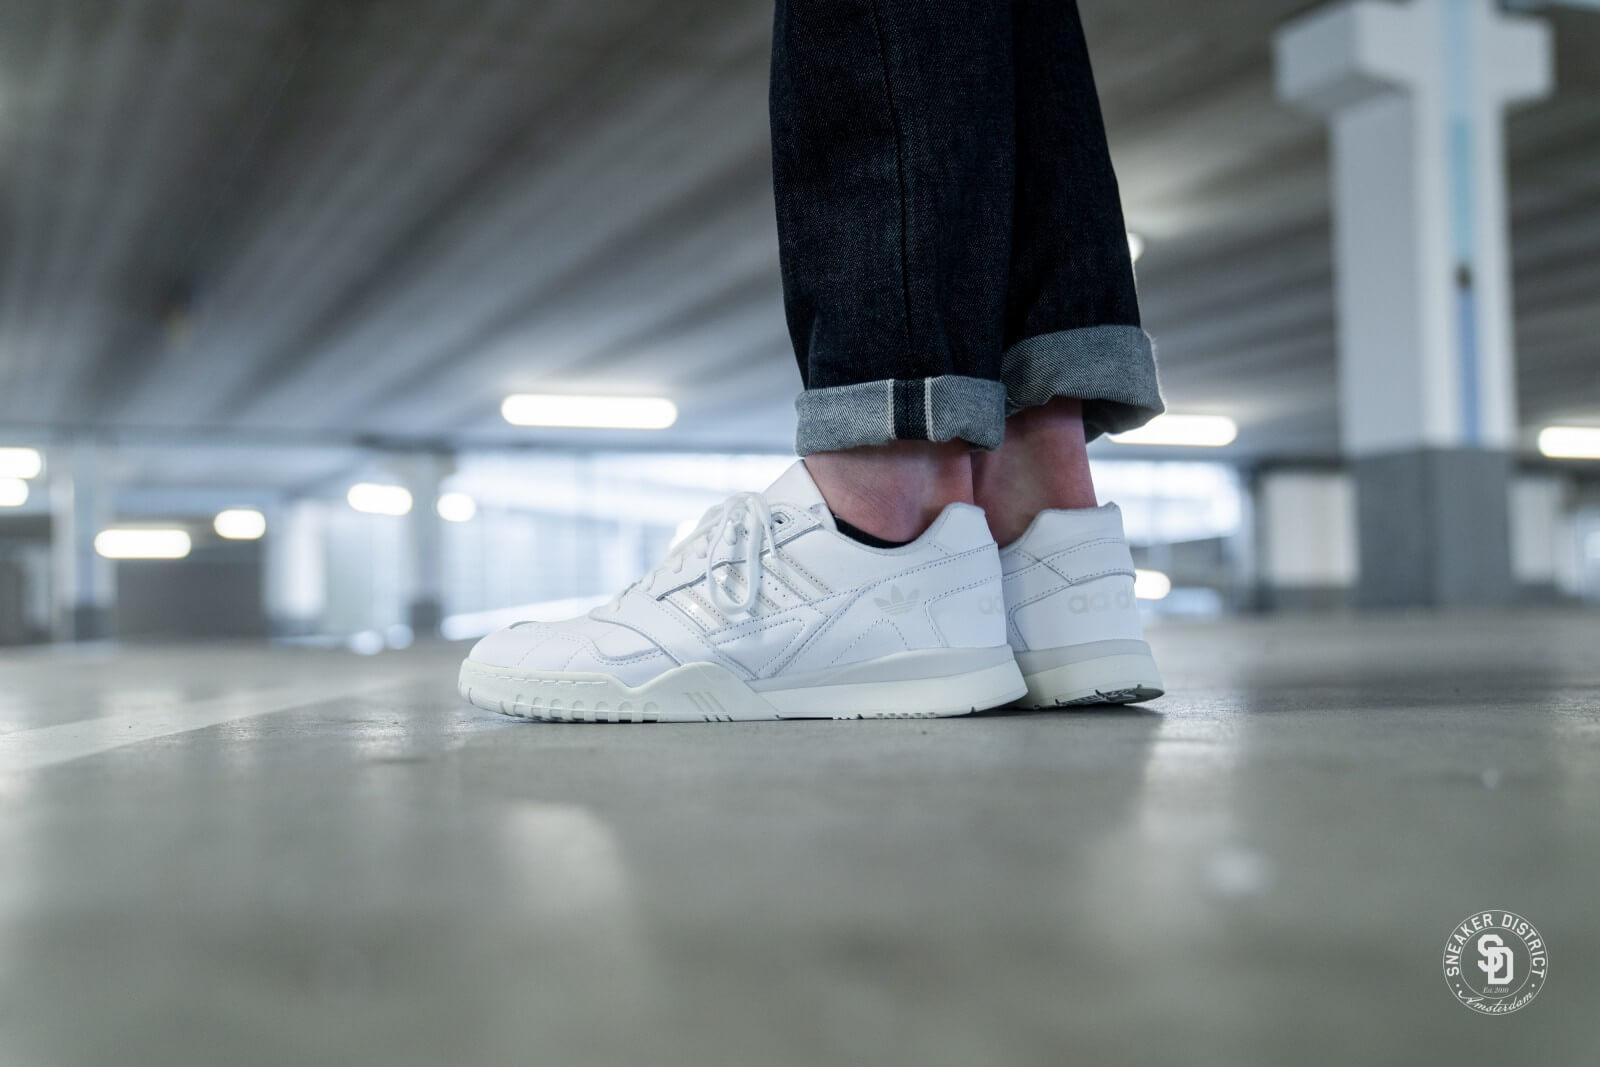 Adidas A.R. Trainer Footwear White/Raw White - CG6465